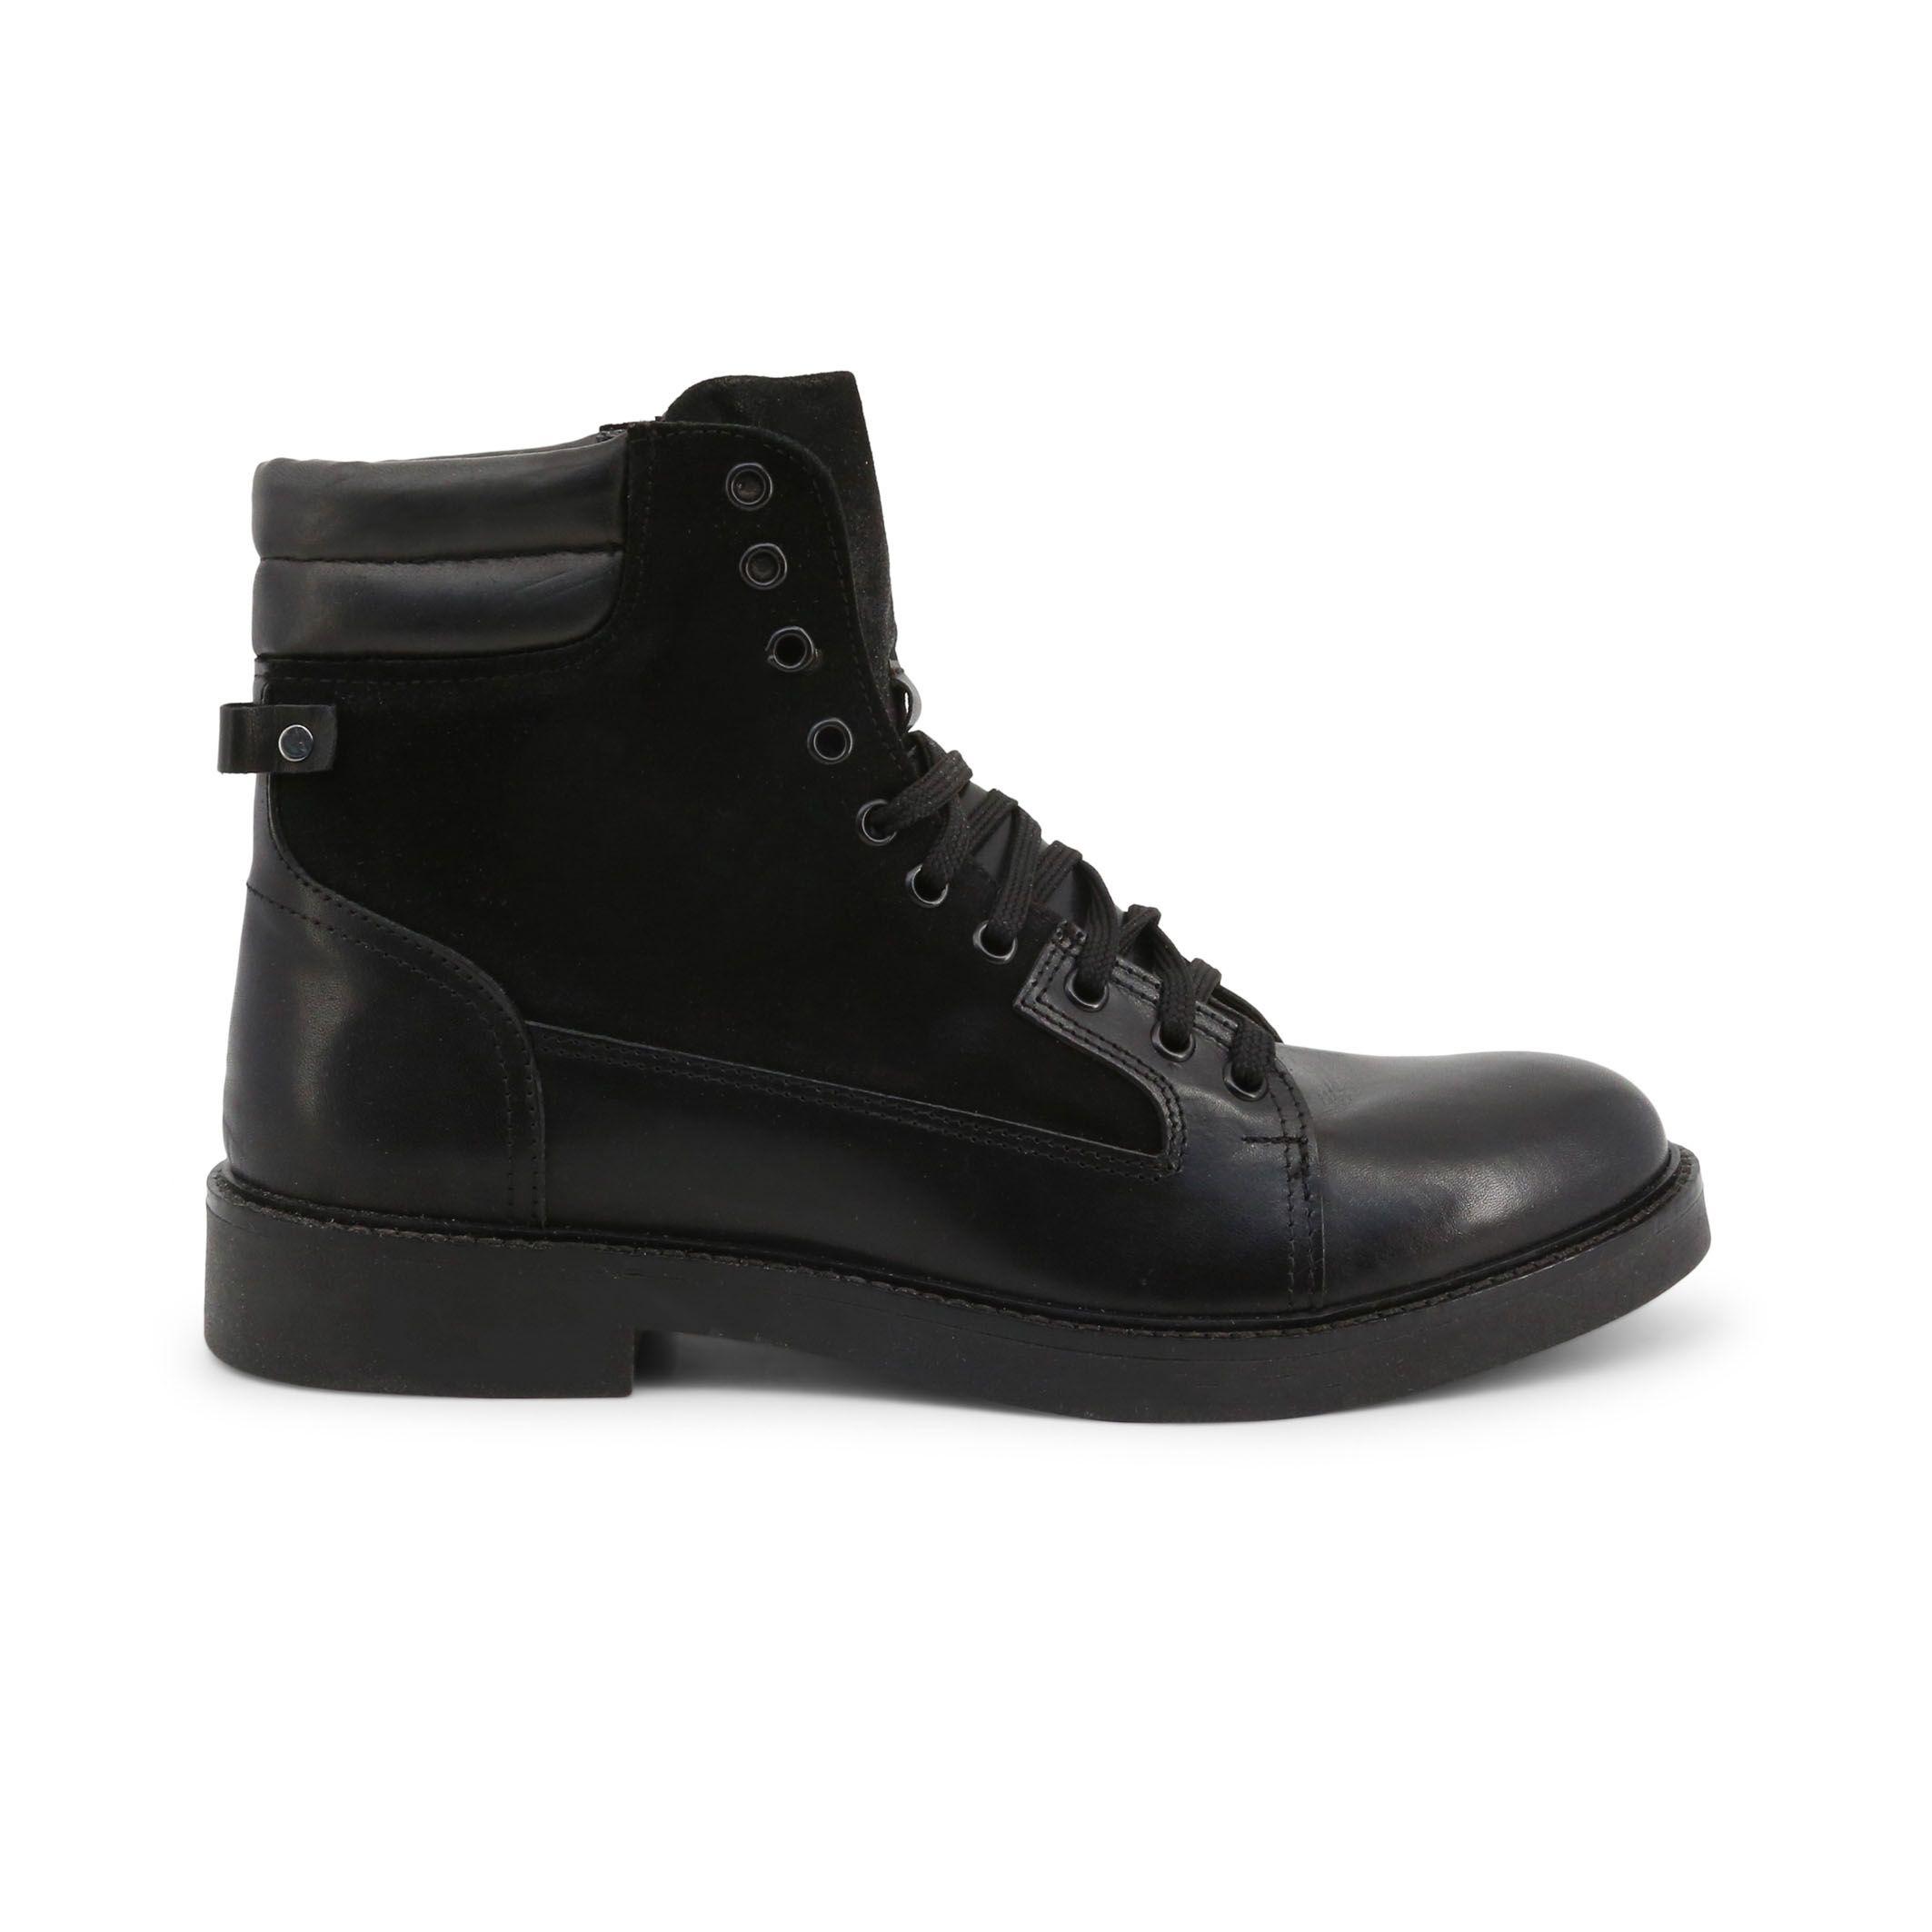 Schuhe Guido Bassi – 1012_CERATO – Schwarz